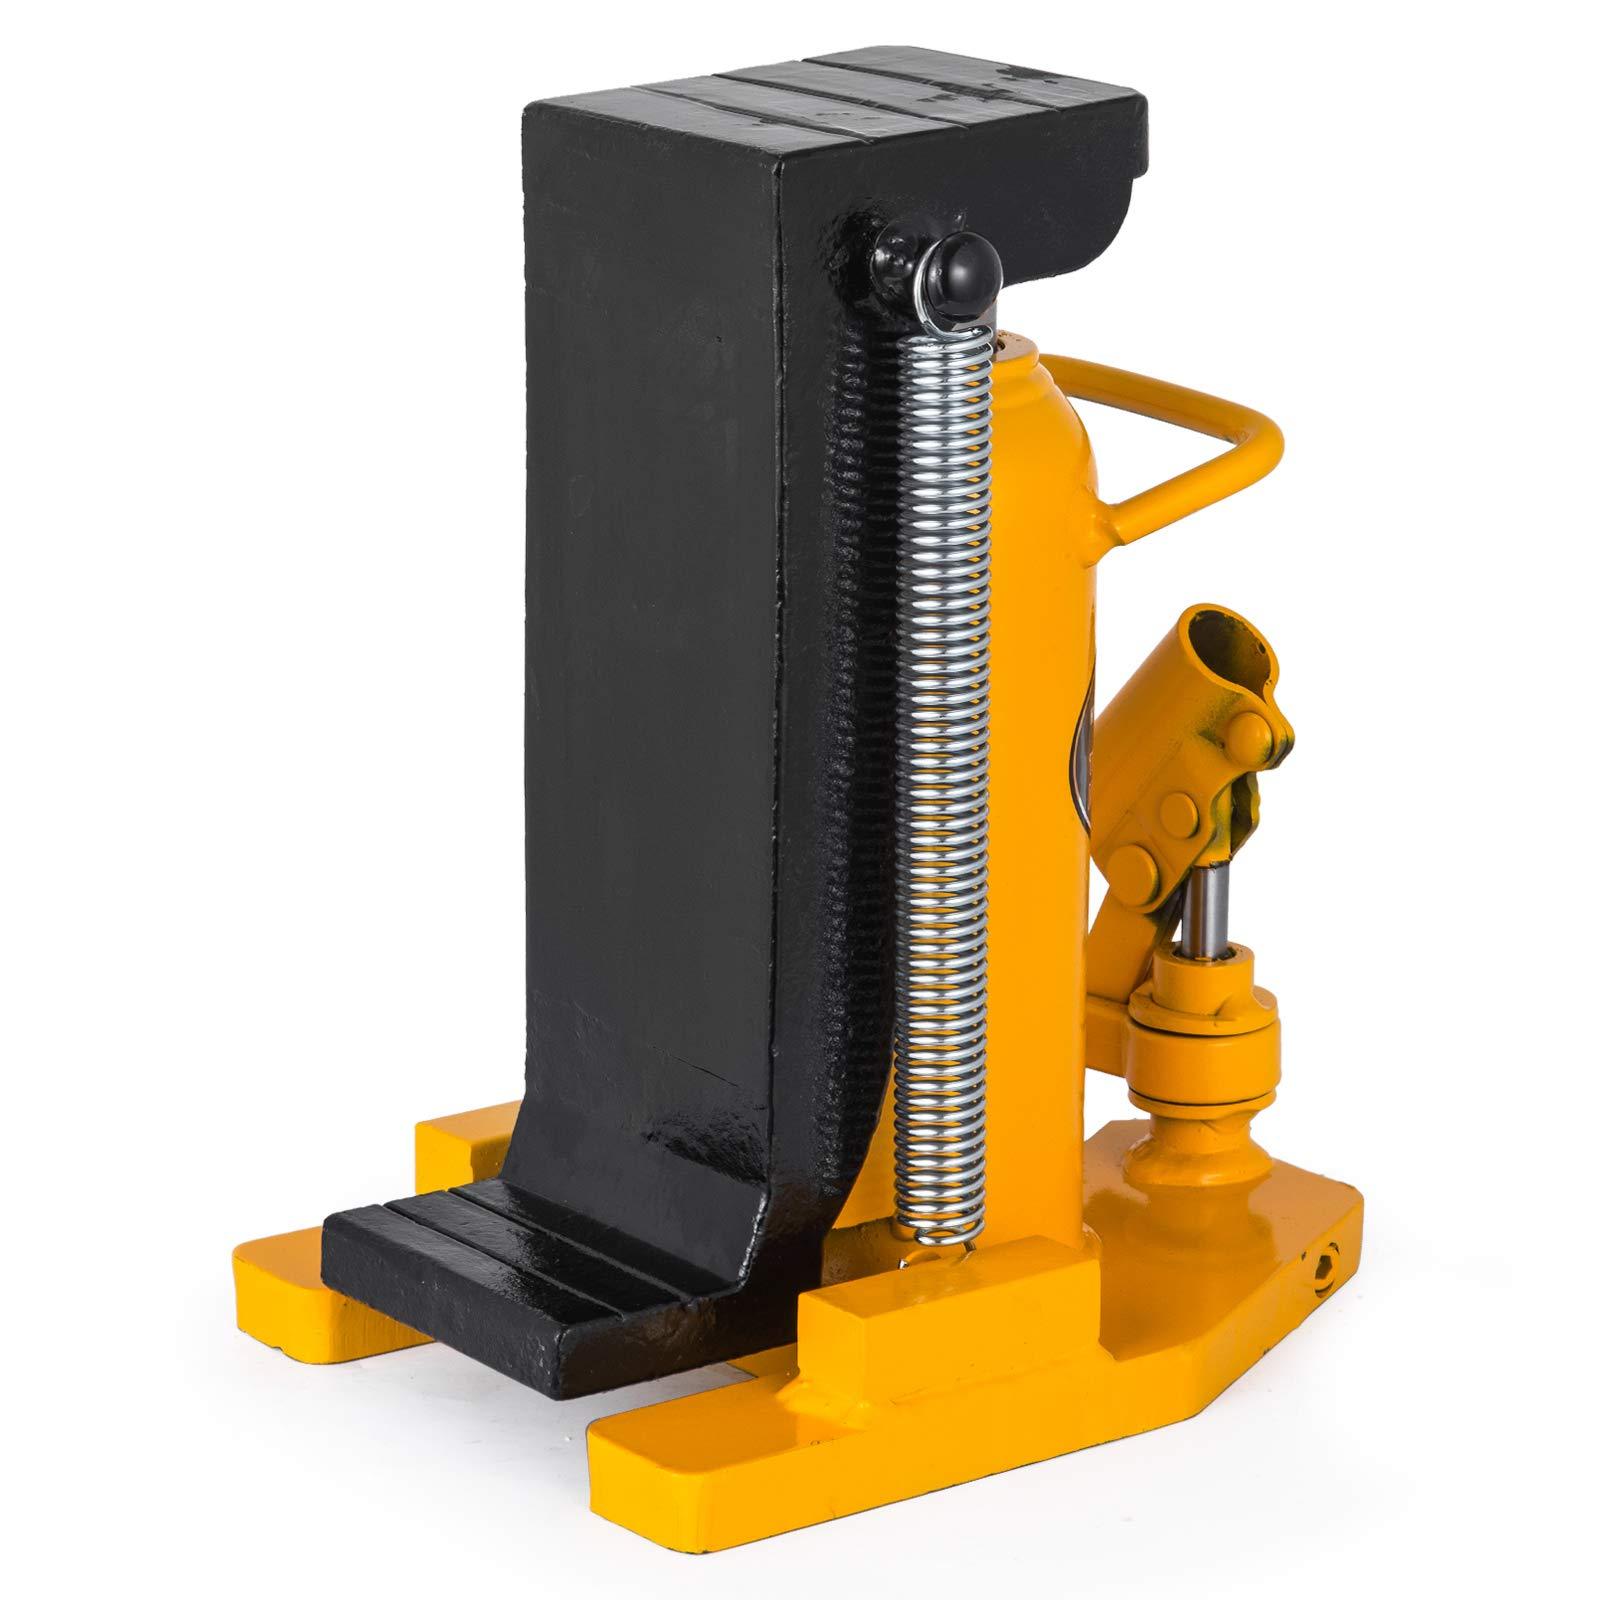 Mophorn Toe Jack Lift Hydraulic Machine Toe Jack Lift Air Hydraulic Toe Jack Proprietary Heat-Treated Steel (10-20Ton Yellow) by Mophorn